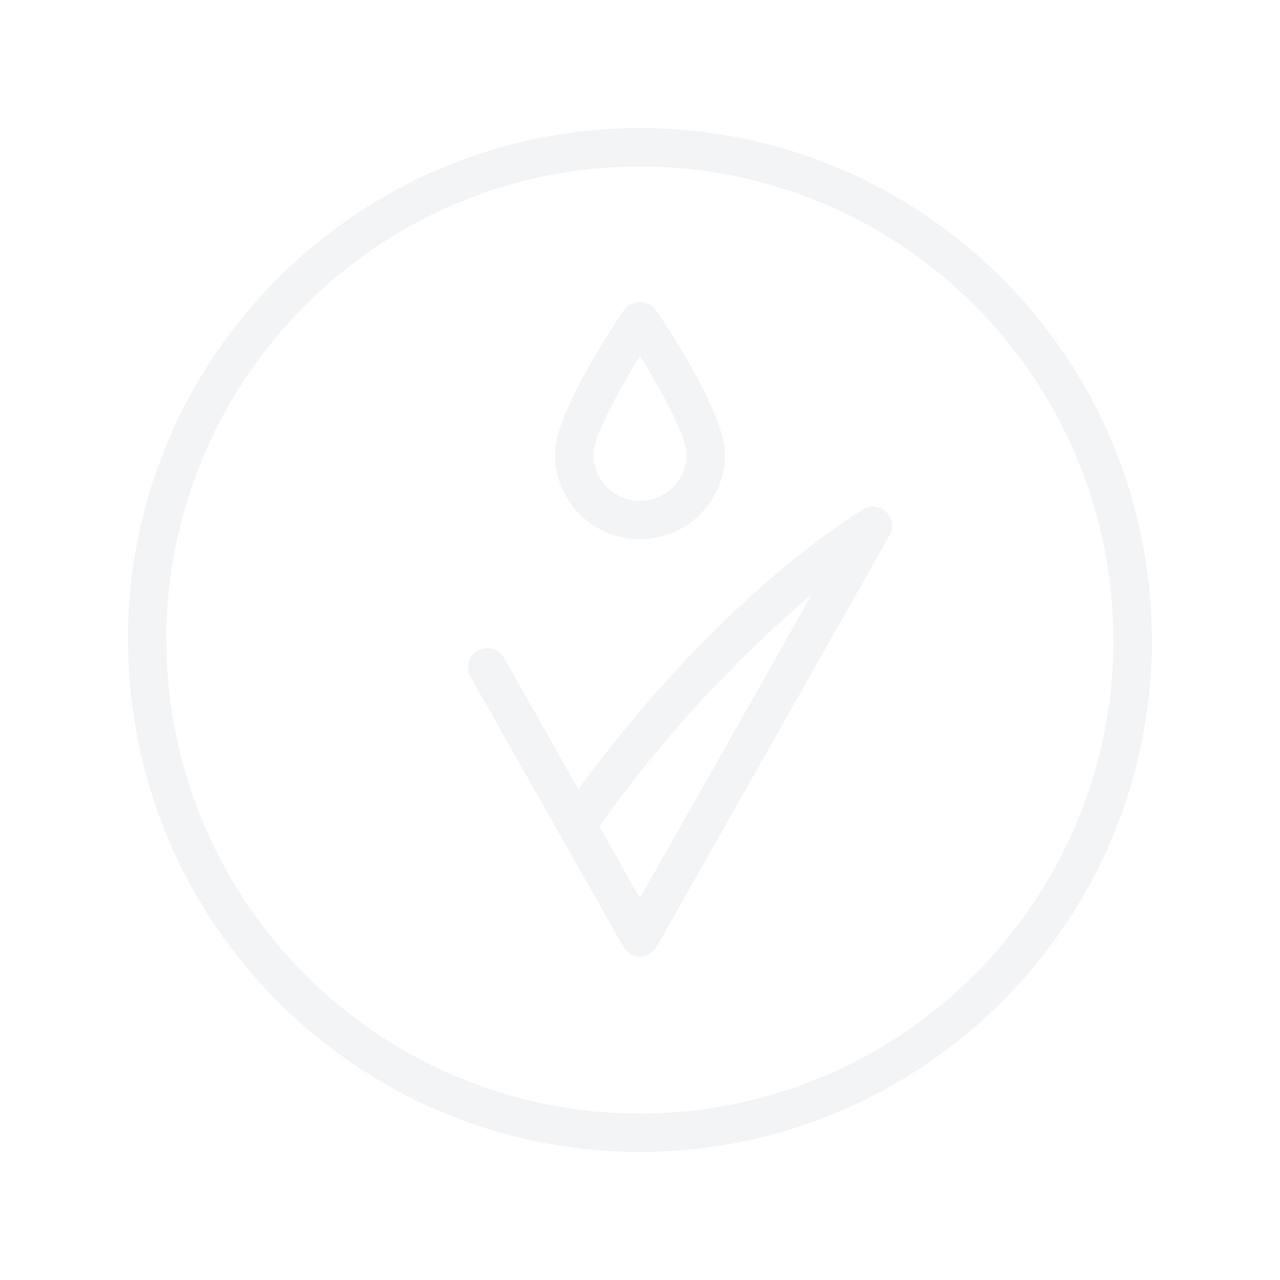 Dr. Hauschka Тонирующее средство для кожи 30ml